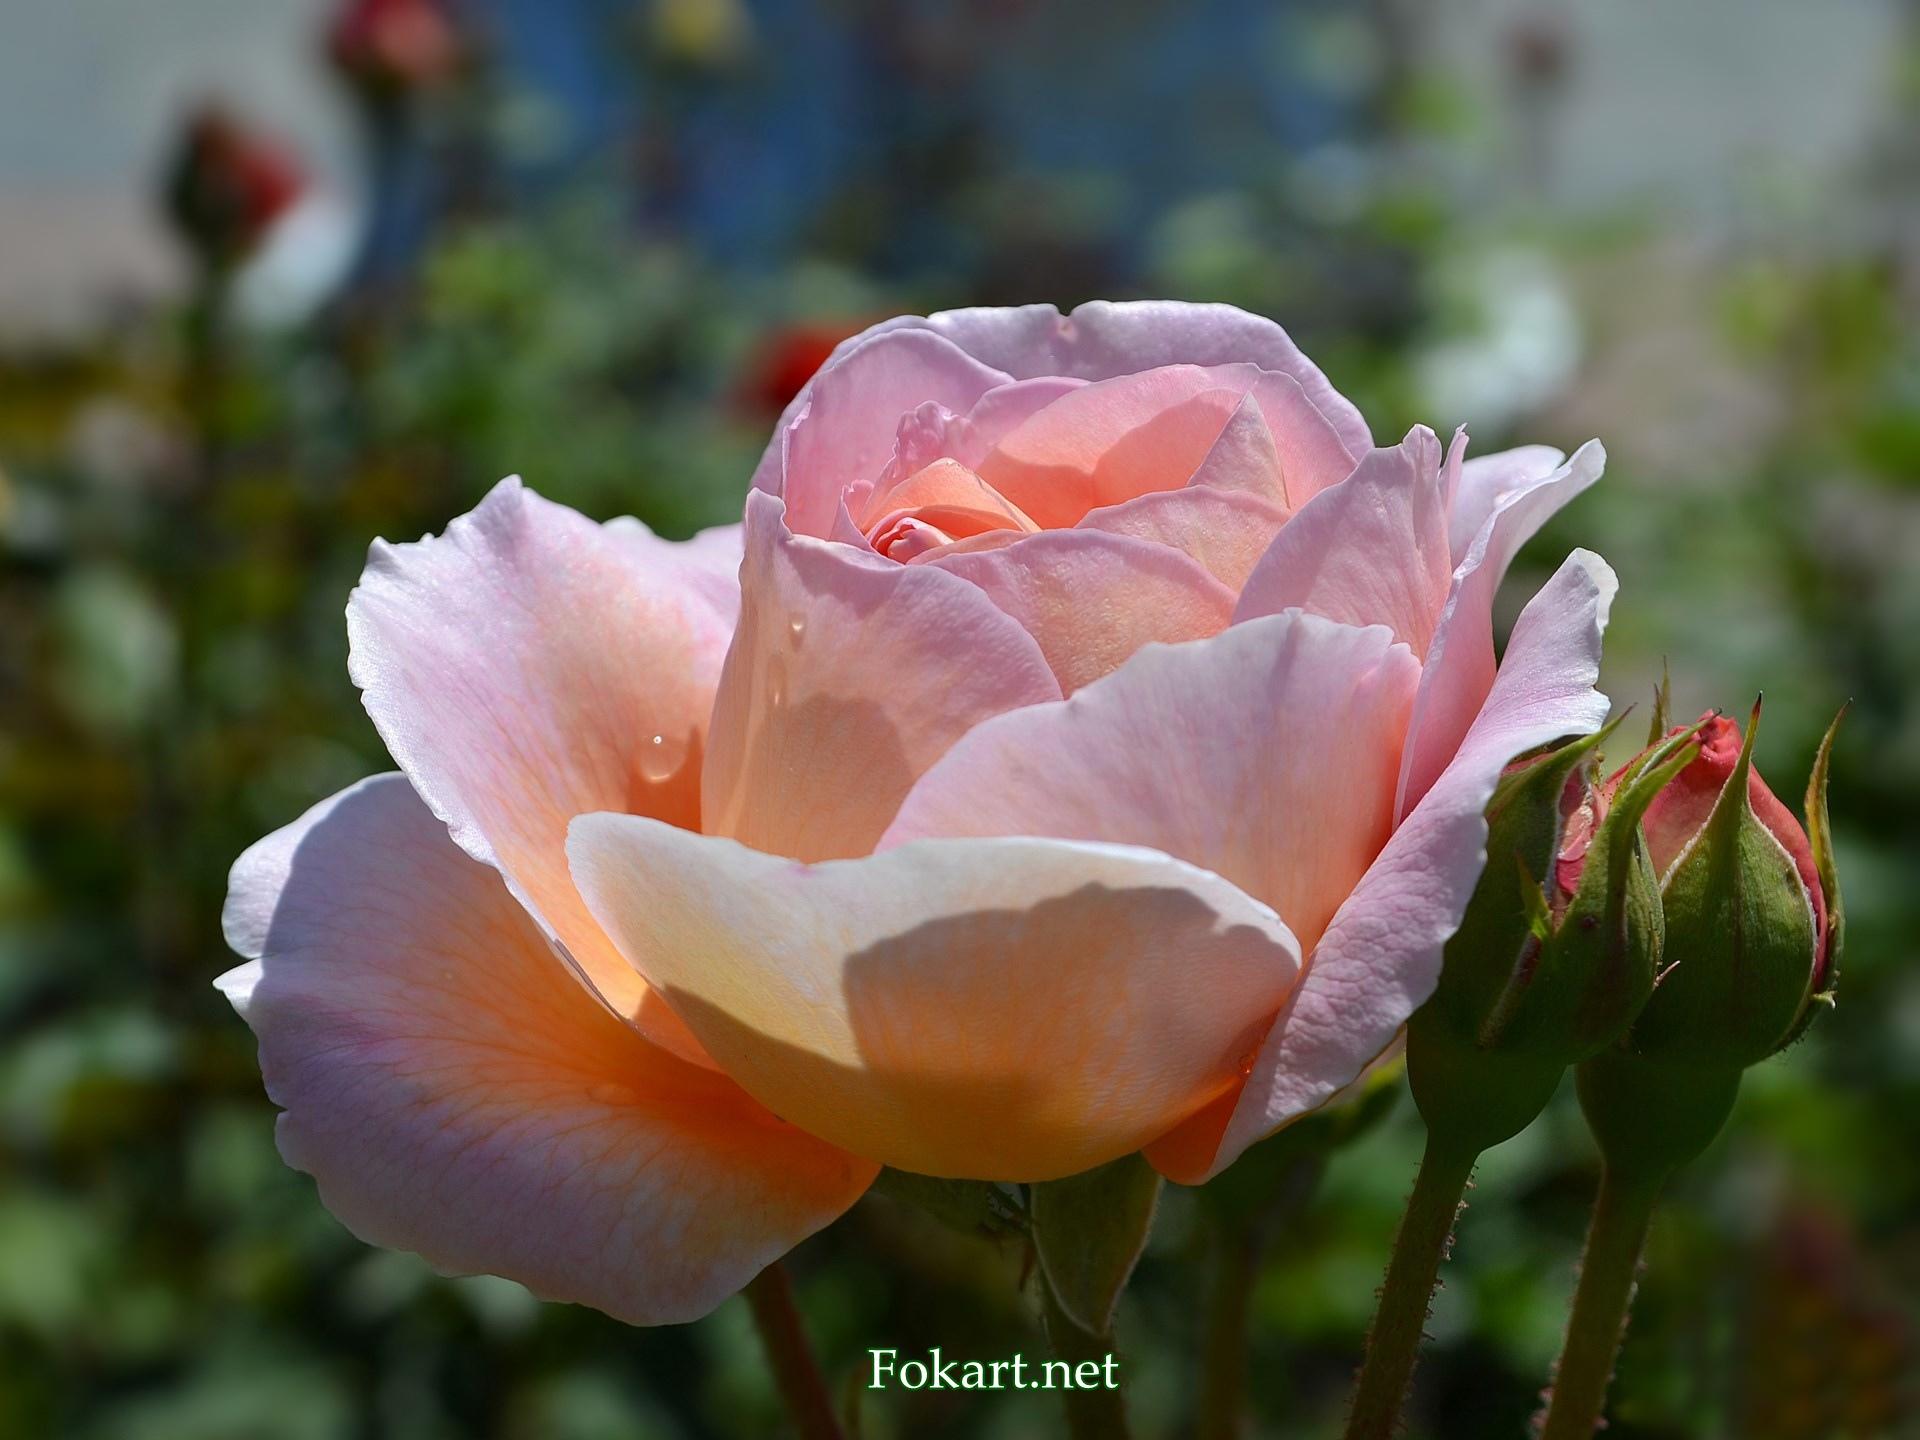 Свежая светло-розовая роза с капельками